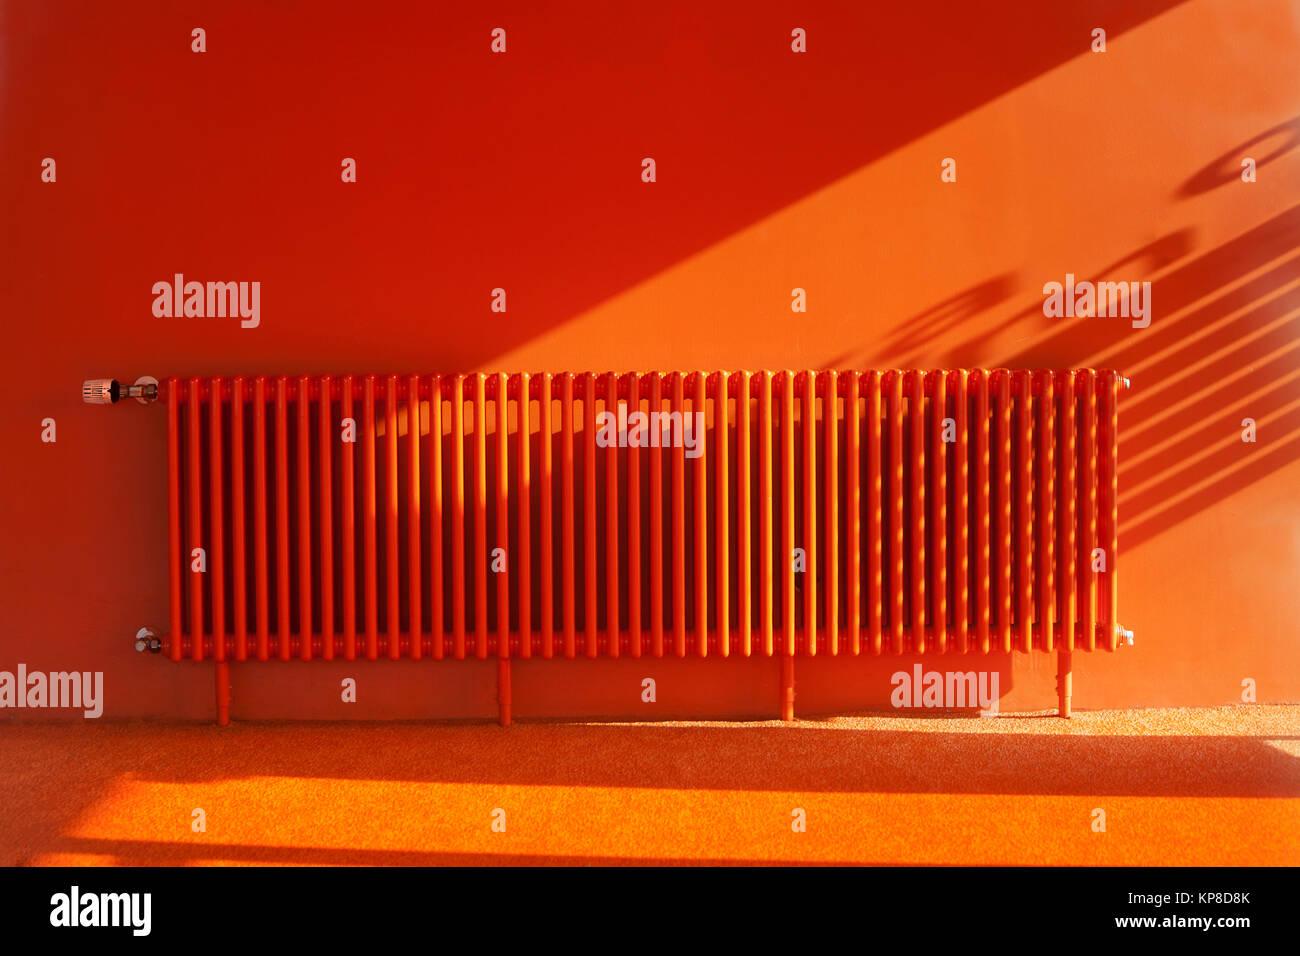 Orange radiator in a retro orange room - Stock Image